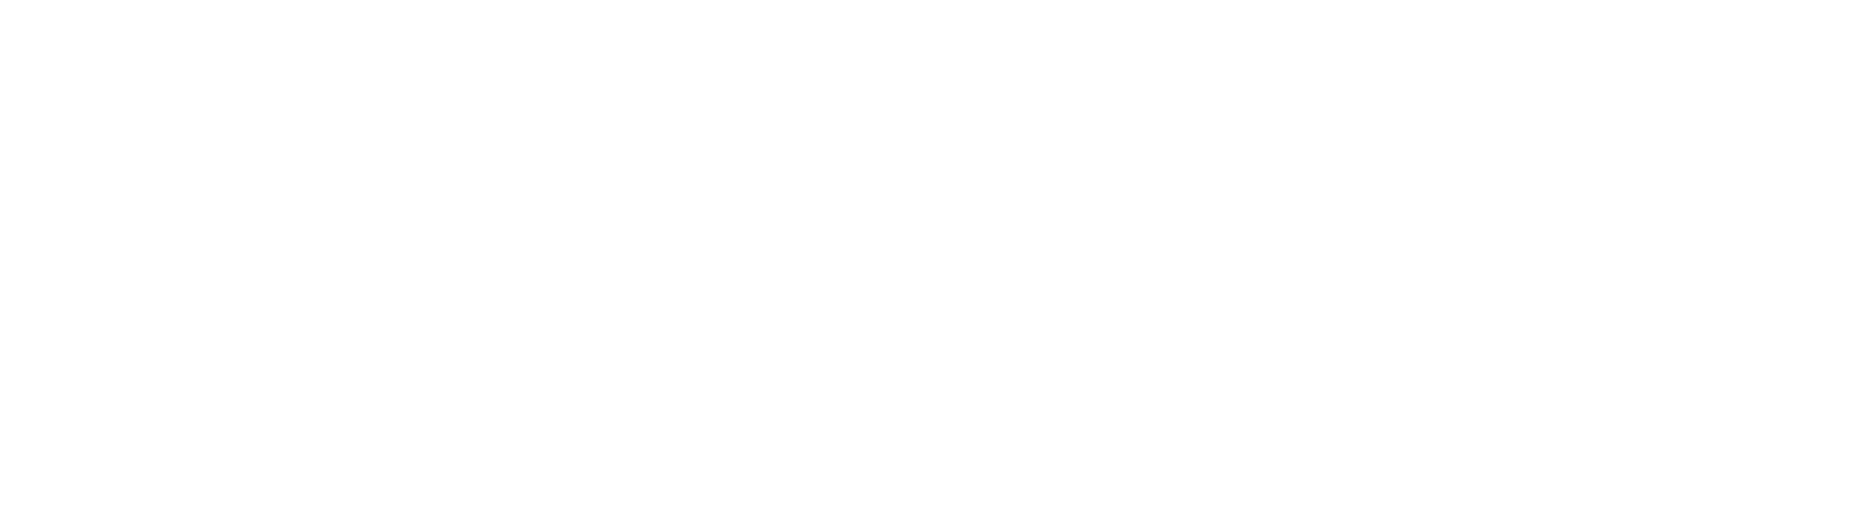 logo-zkoledujse-web-02